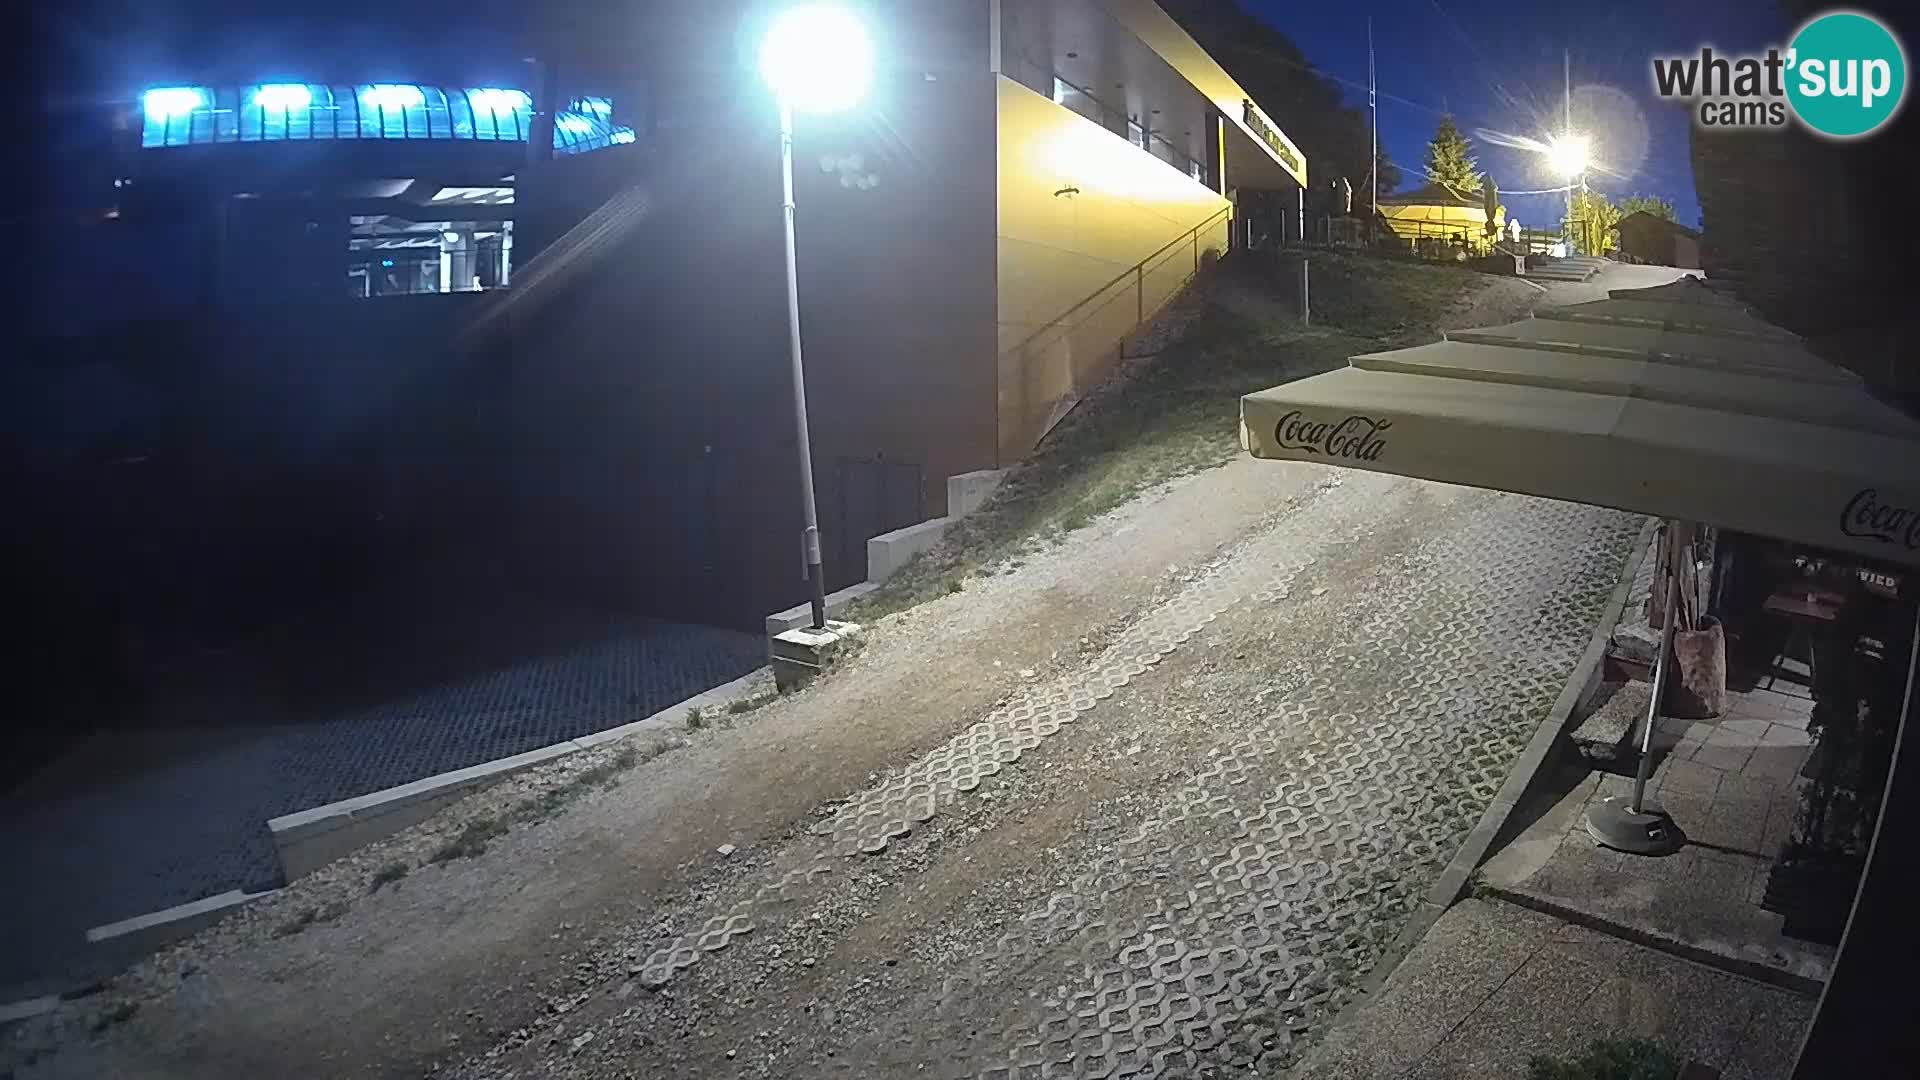 Sljeme – Ski-Zentrum in der Nähe von Zagreb